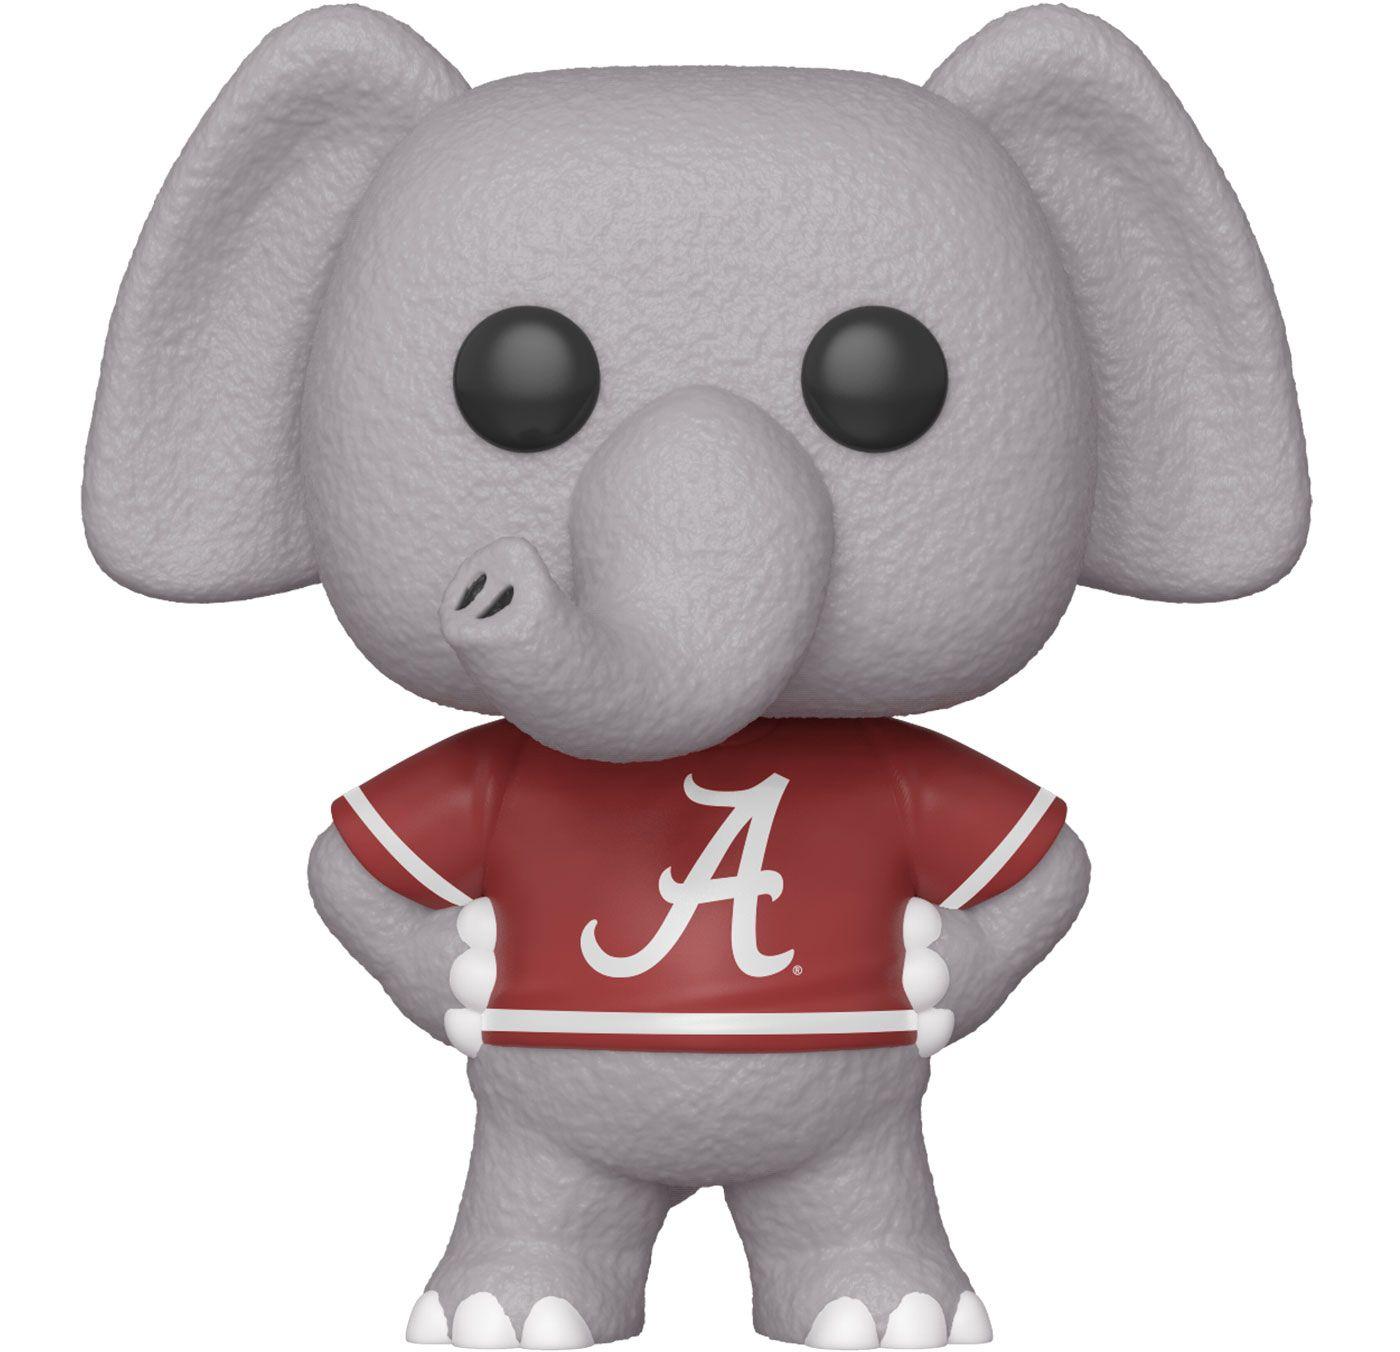 Funko POP! Alabama Crimson Tide Mascot Figure